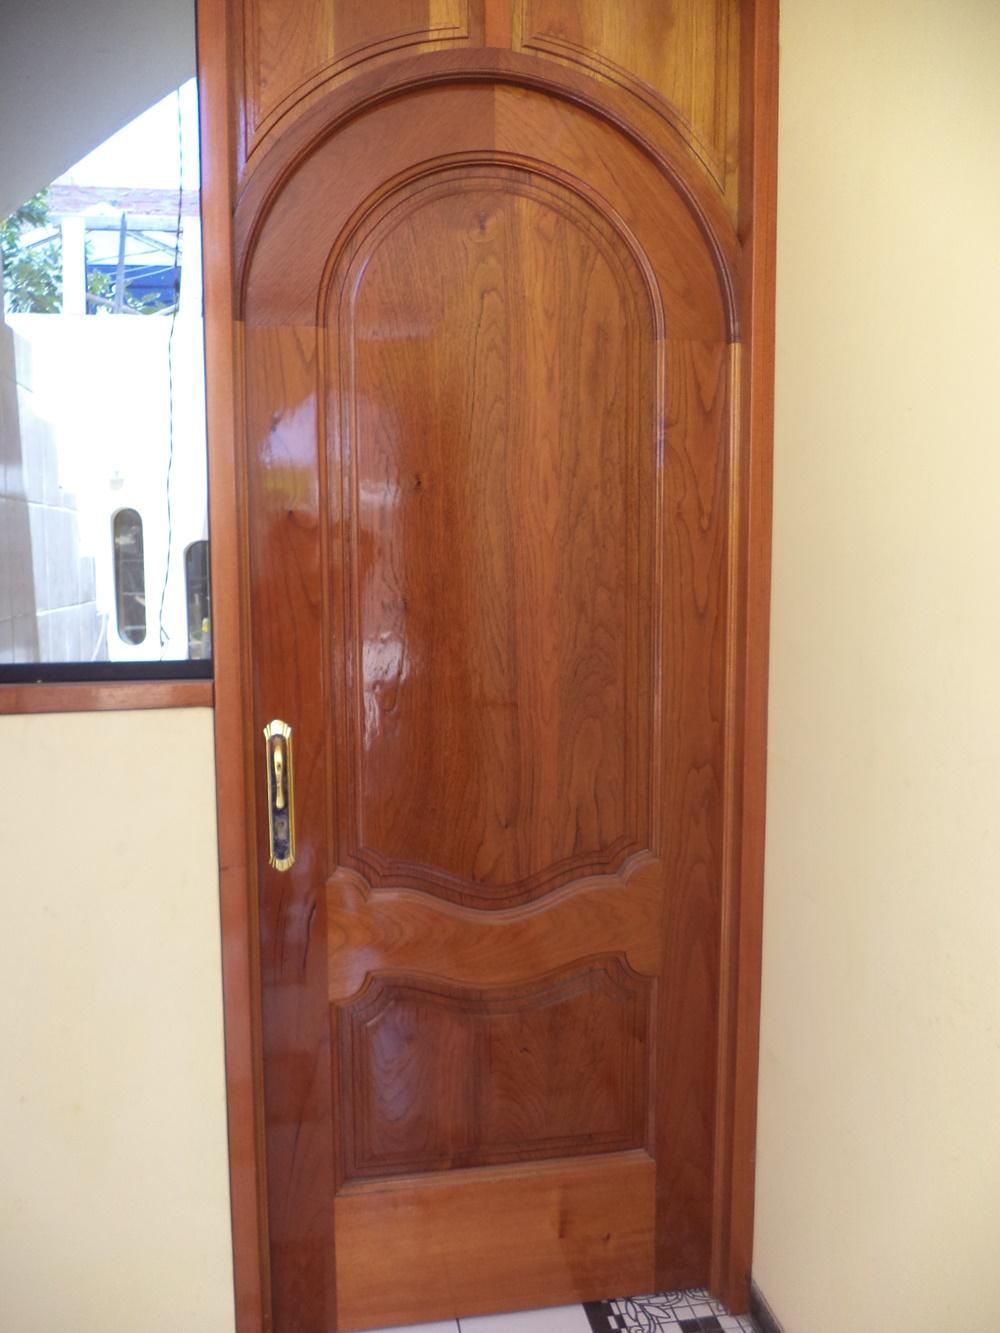 Puertas madera interiores with puertas madera interiores for Puertas de madera para interiores